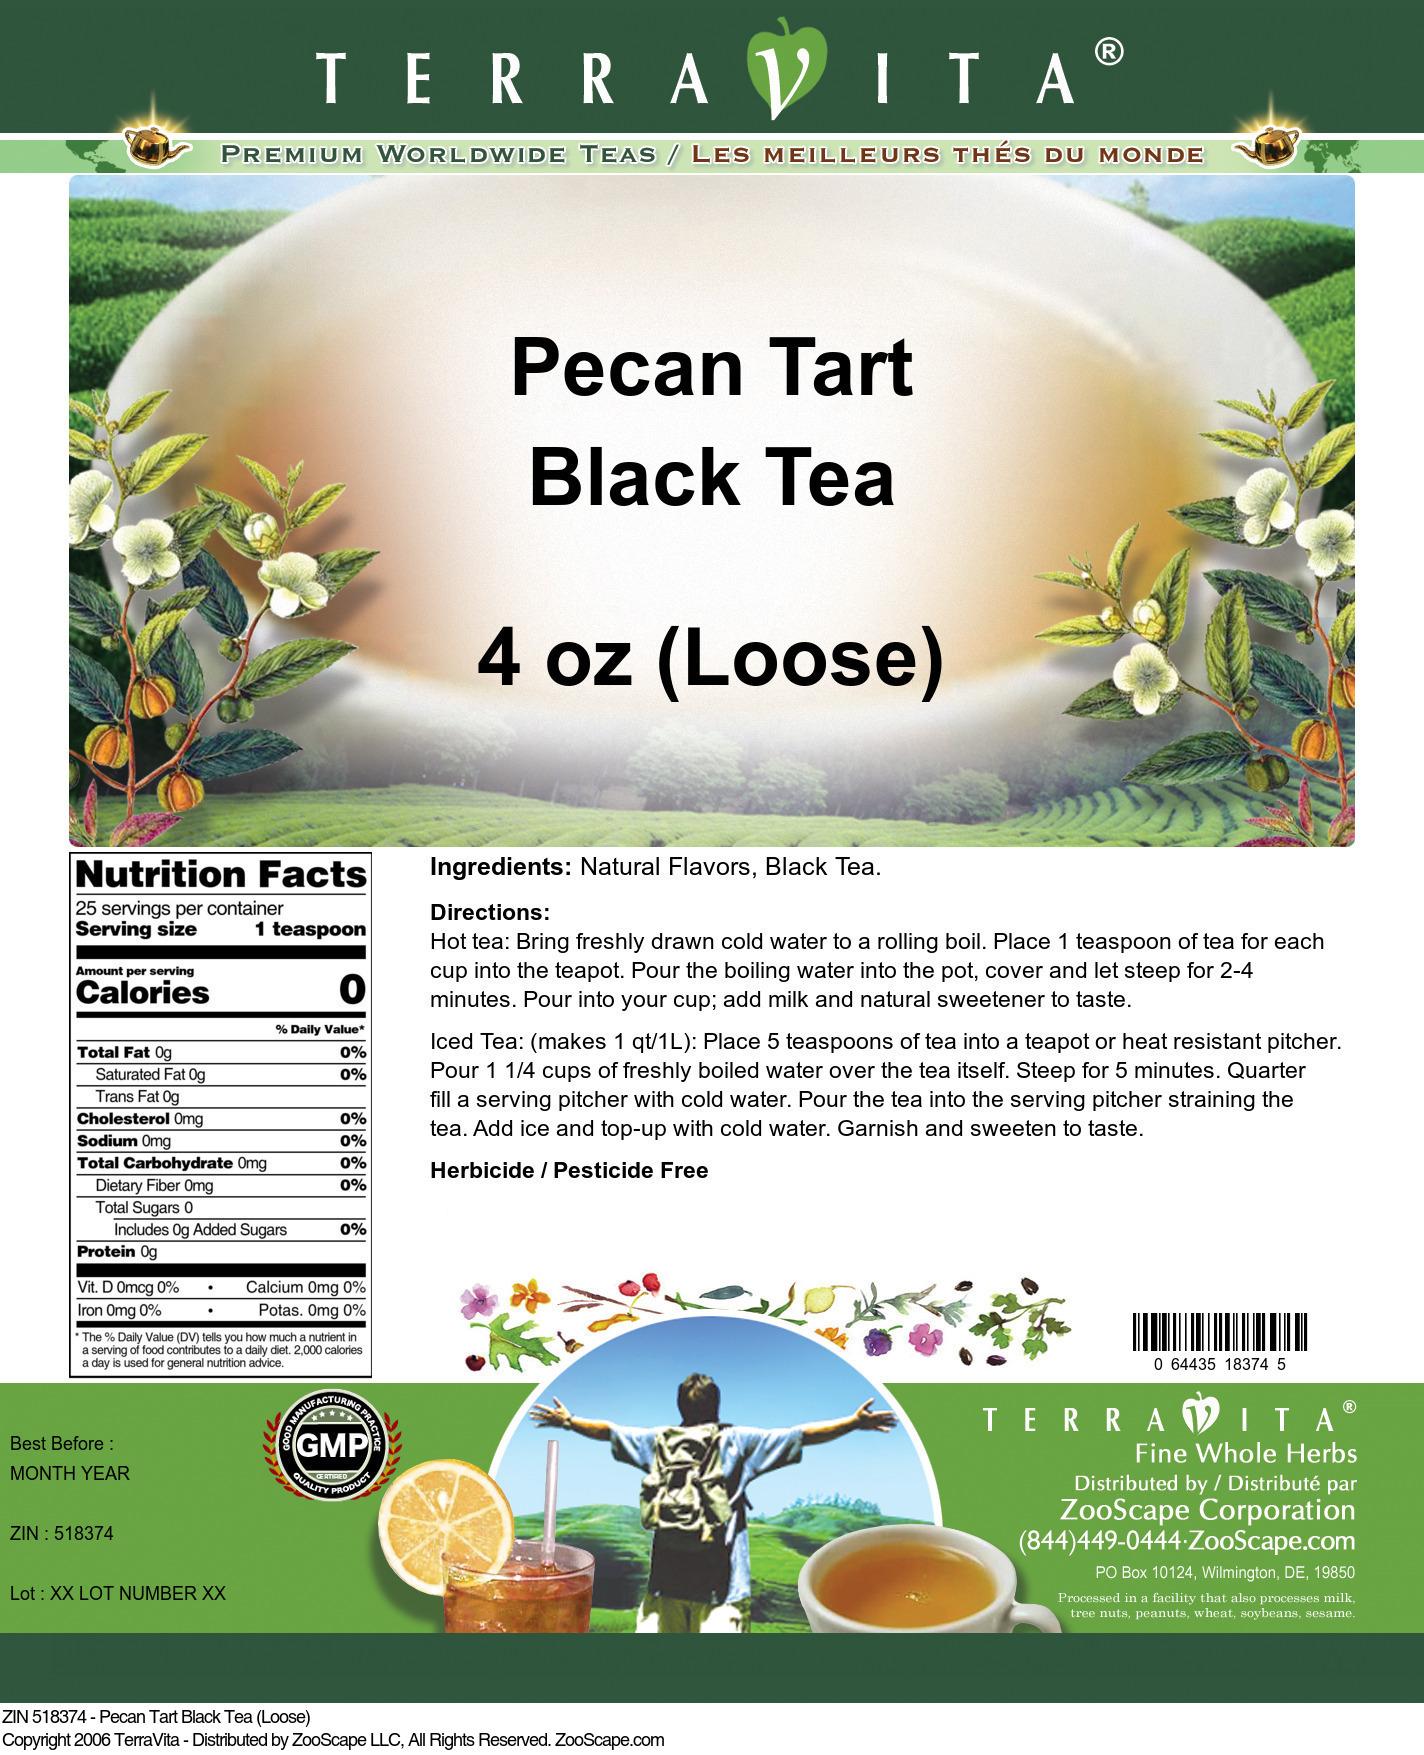 Pecan Tart Black Tea (Loose)